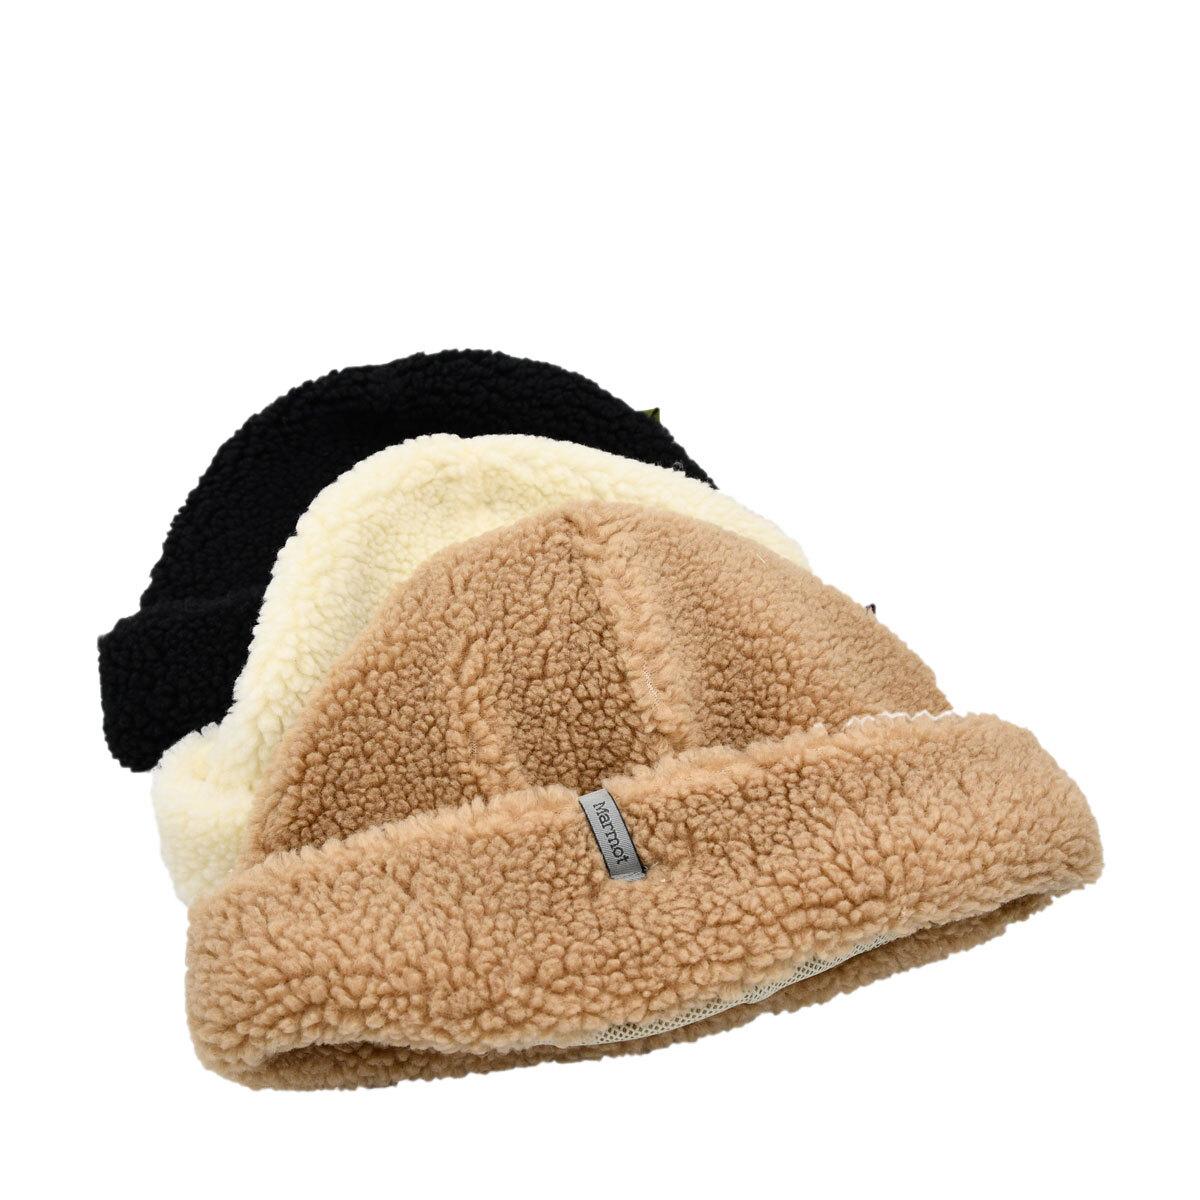 Marmot W's Sheep Fleece Beanie ウィメンズシープフリースビーニー(四角友里コラボ)マーモット